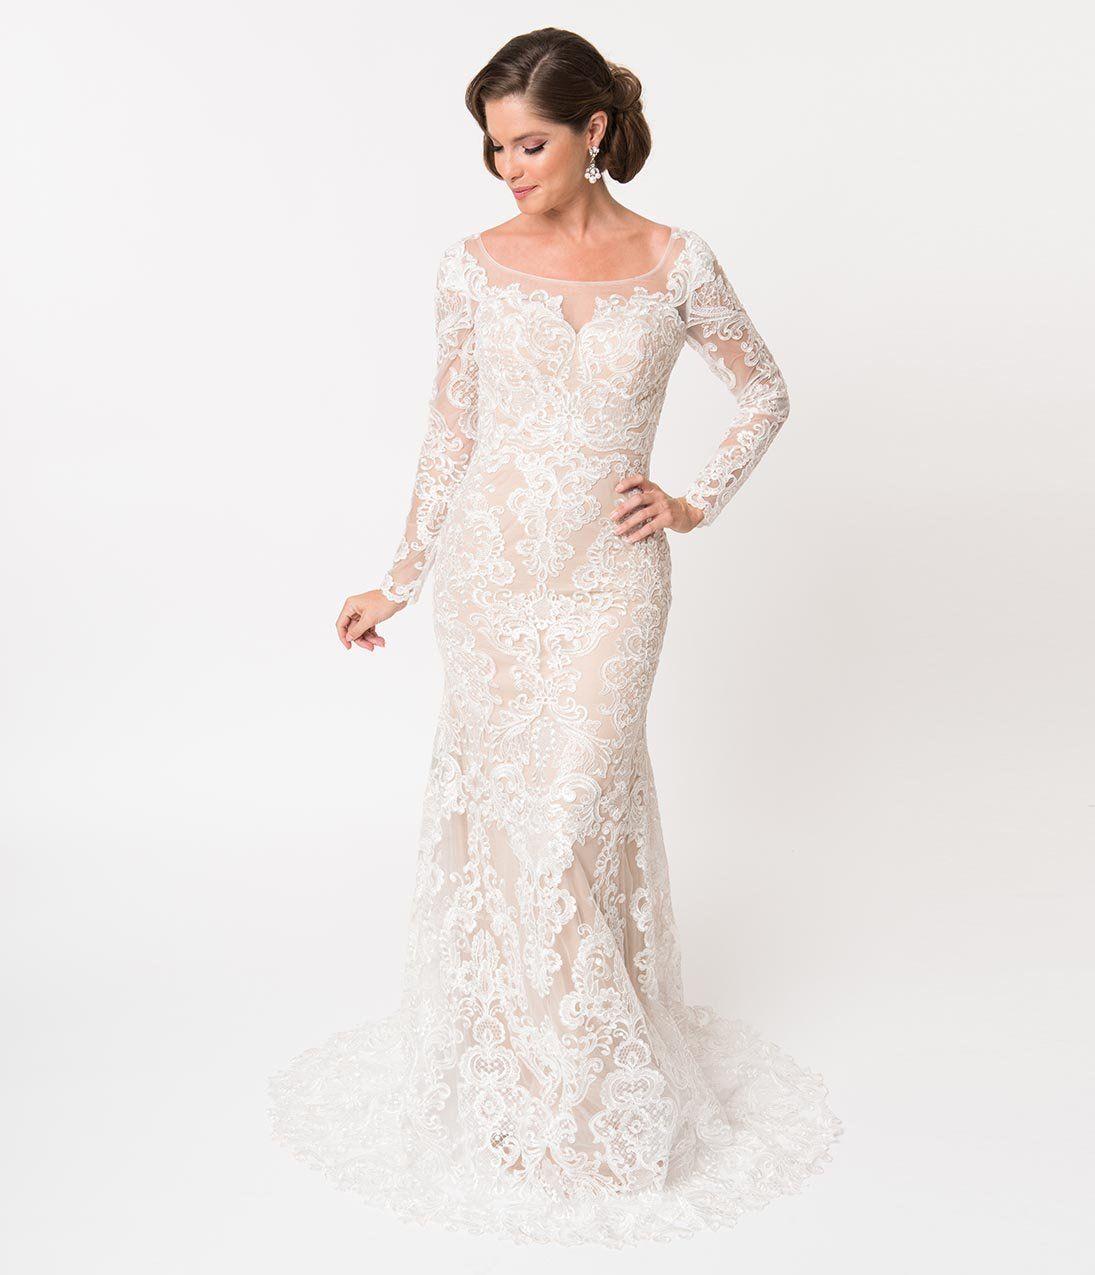 Art Deco Wedding Dress Ivory Lace Long Sleeved Gown 240 00 Unique Prom Dresses Prom Dresses Vintage Vintage Inspired Wedding Dresses [ 1275 x 1095 Pixel ]